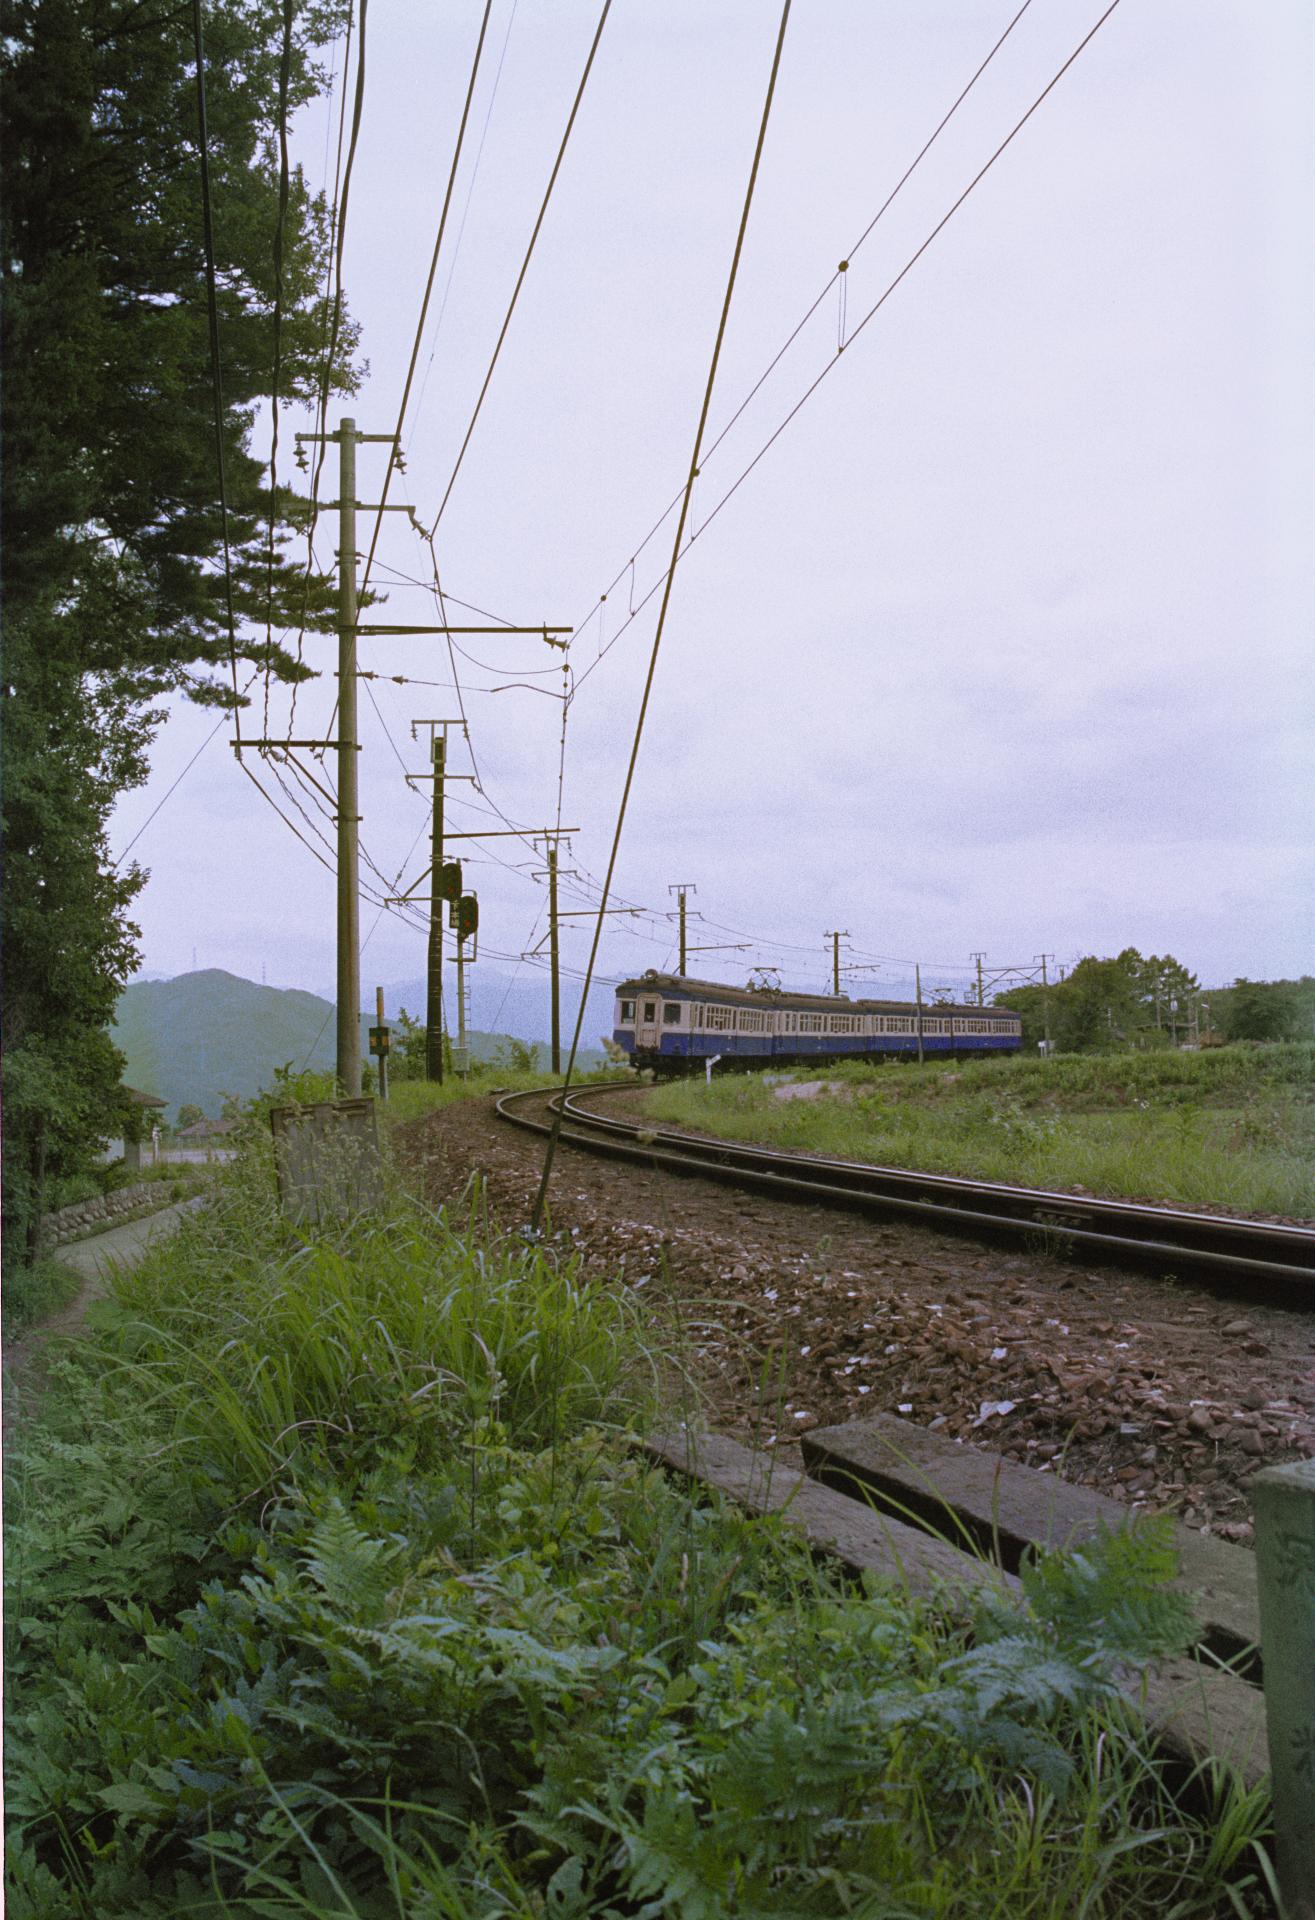 f:id:yasuo_ssi:20210606225032p:plain